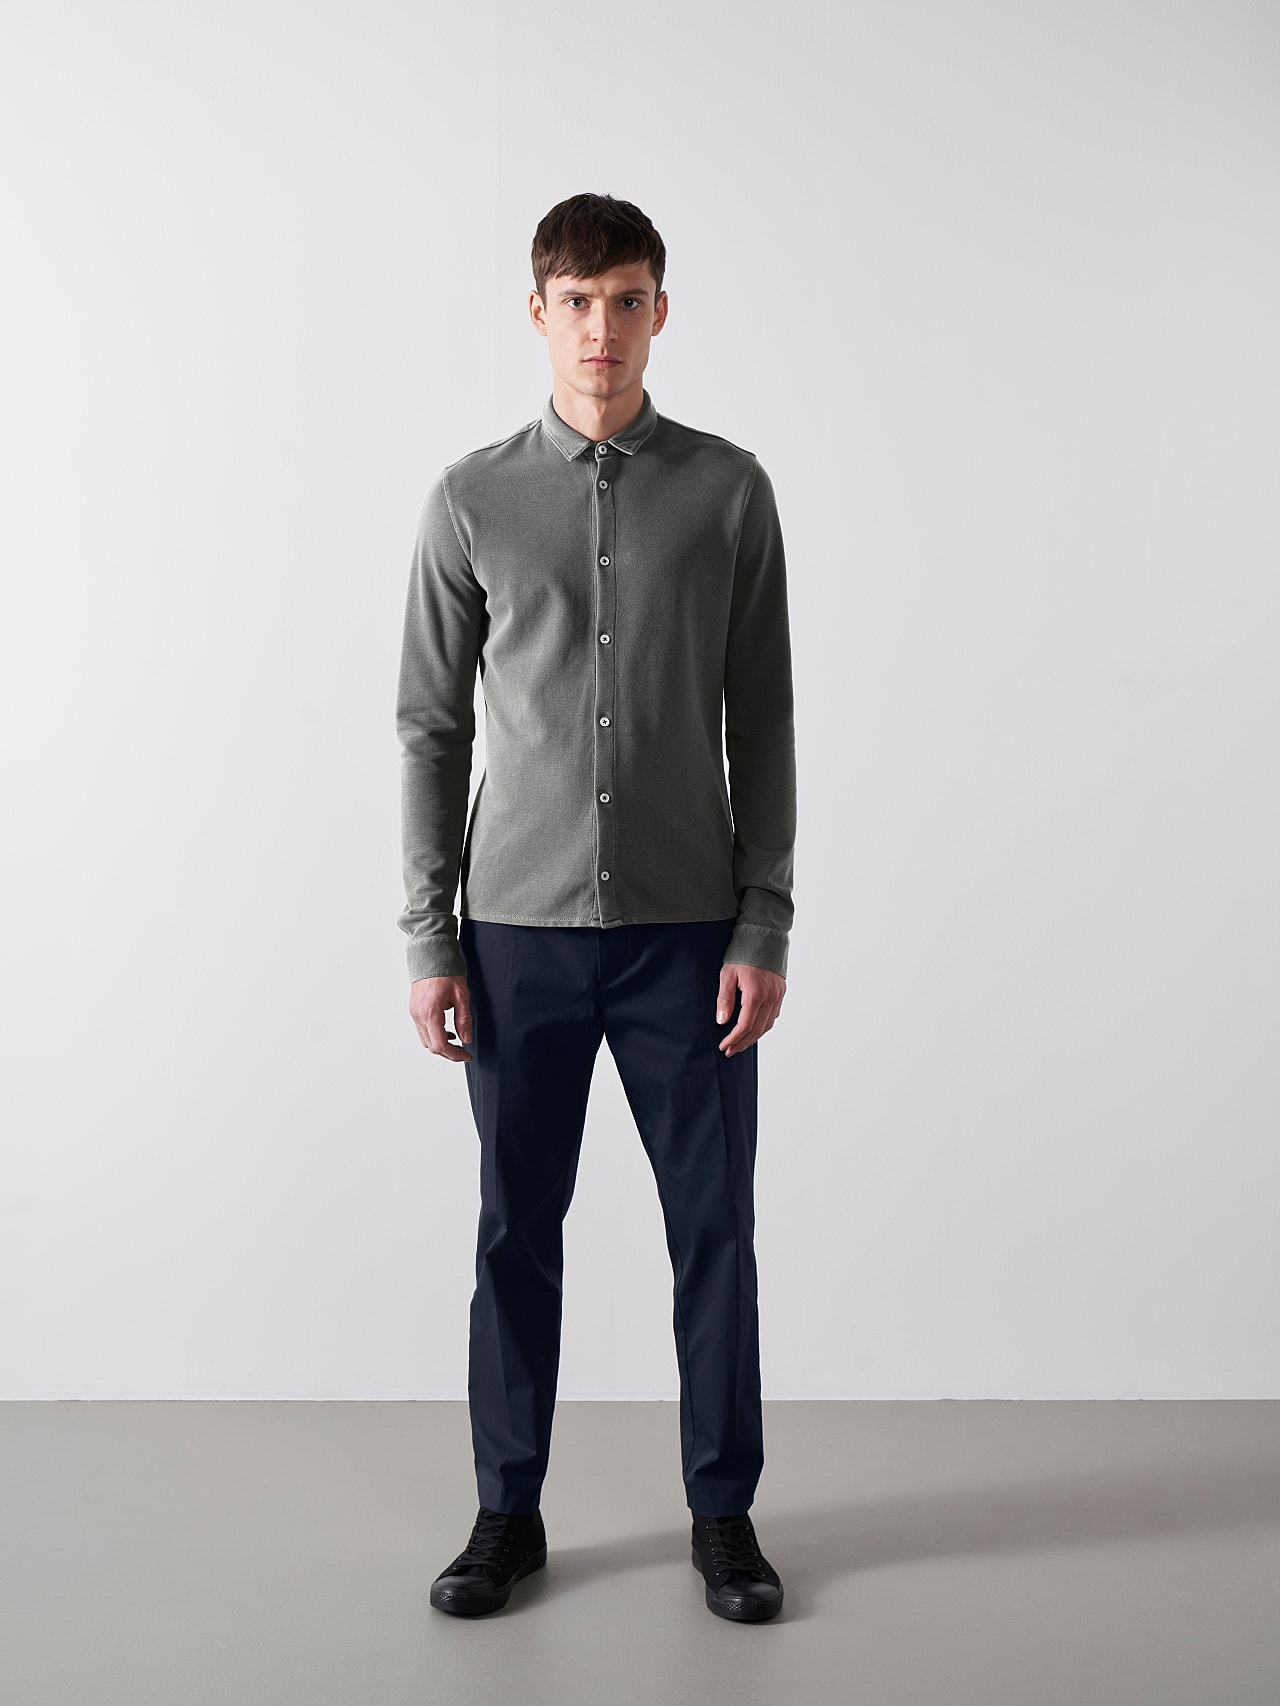 JIQUE V1.Y5.01 Pique Shirt with Kent Collar dark grey / anthracite Front Alpha Tauri